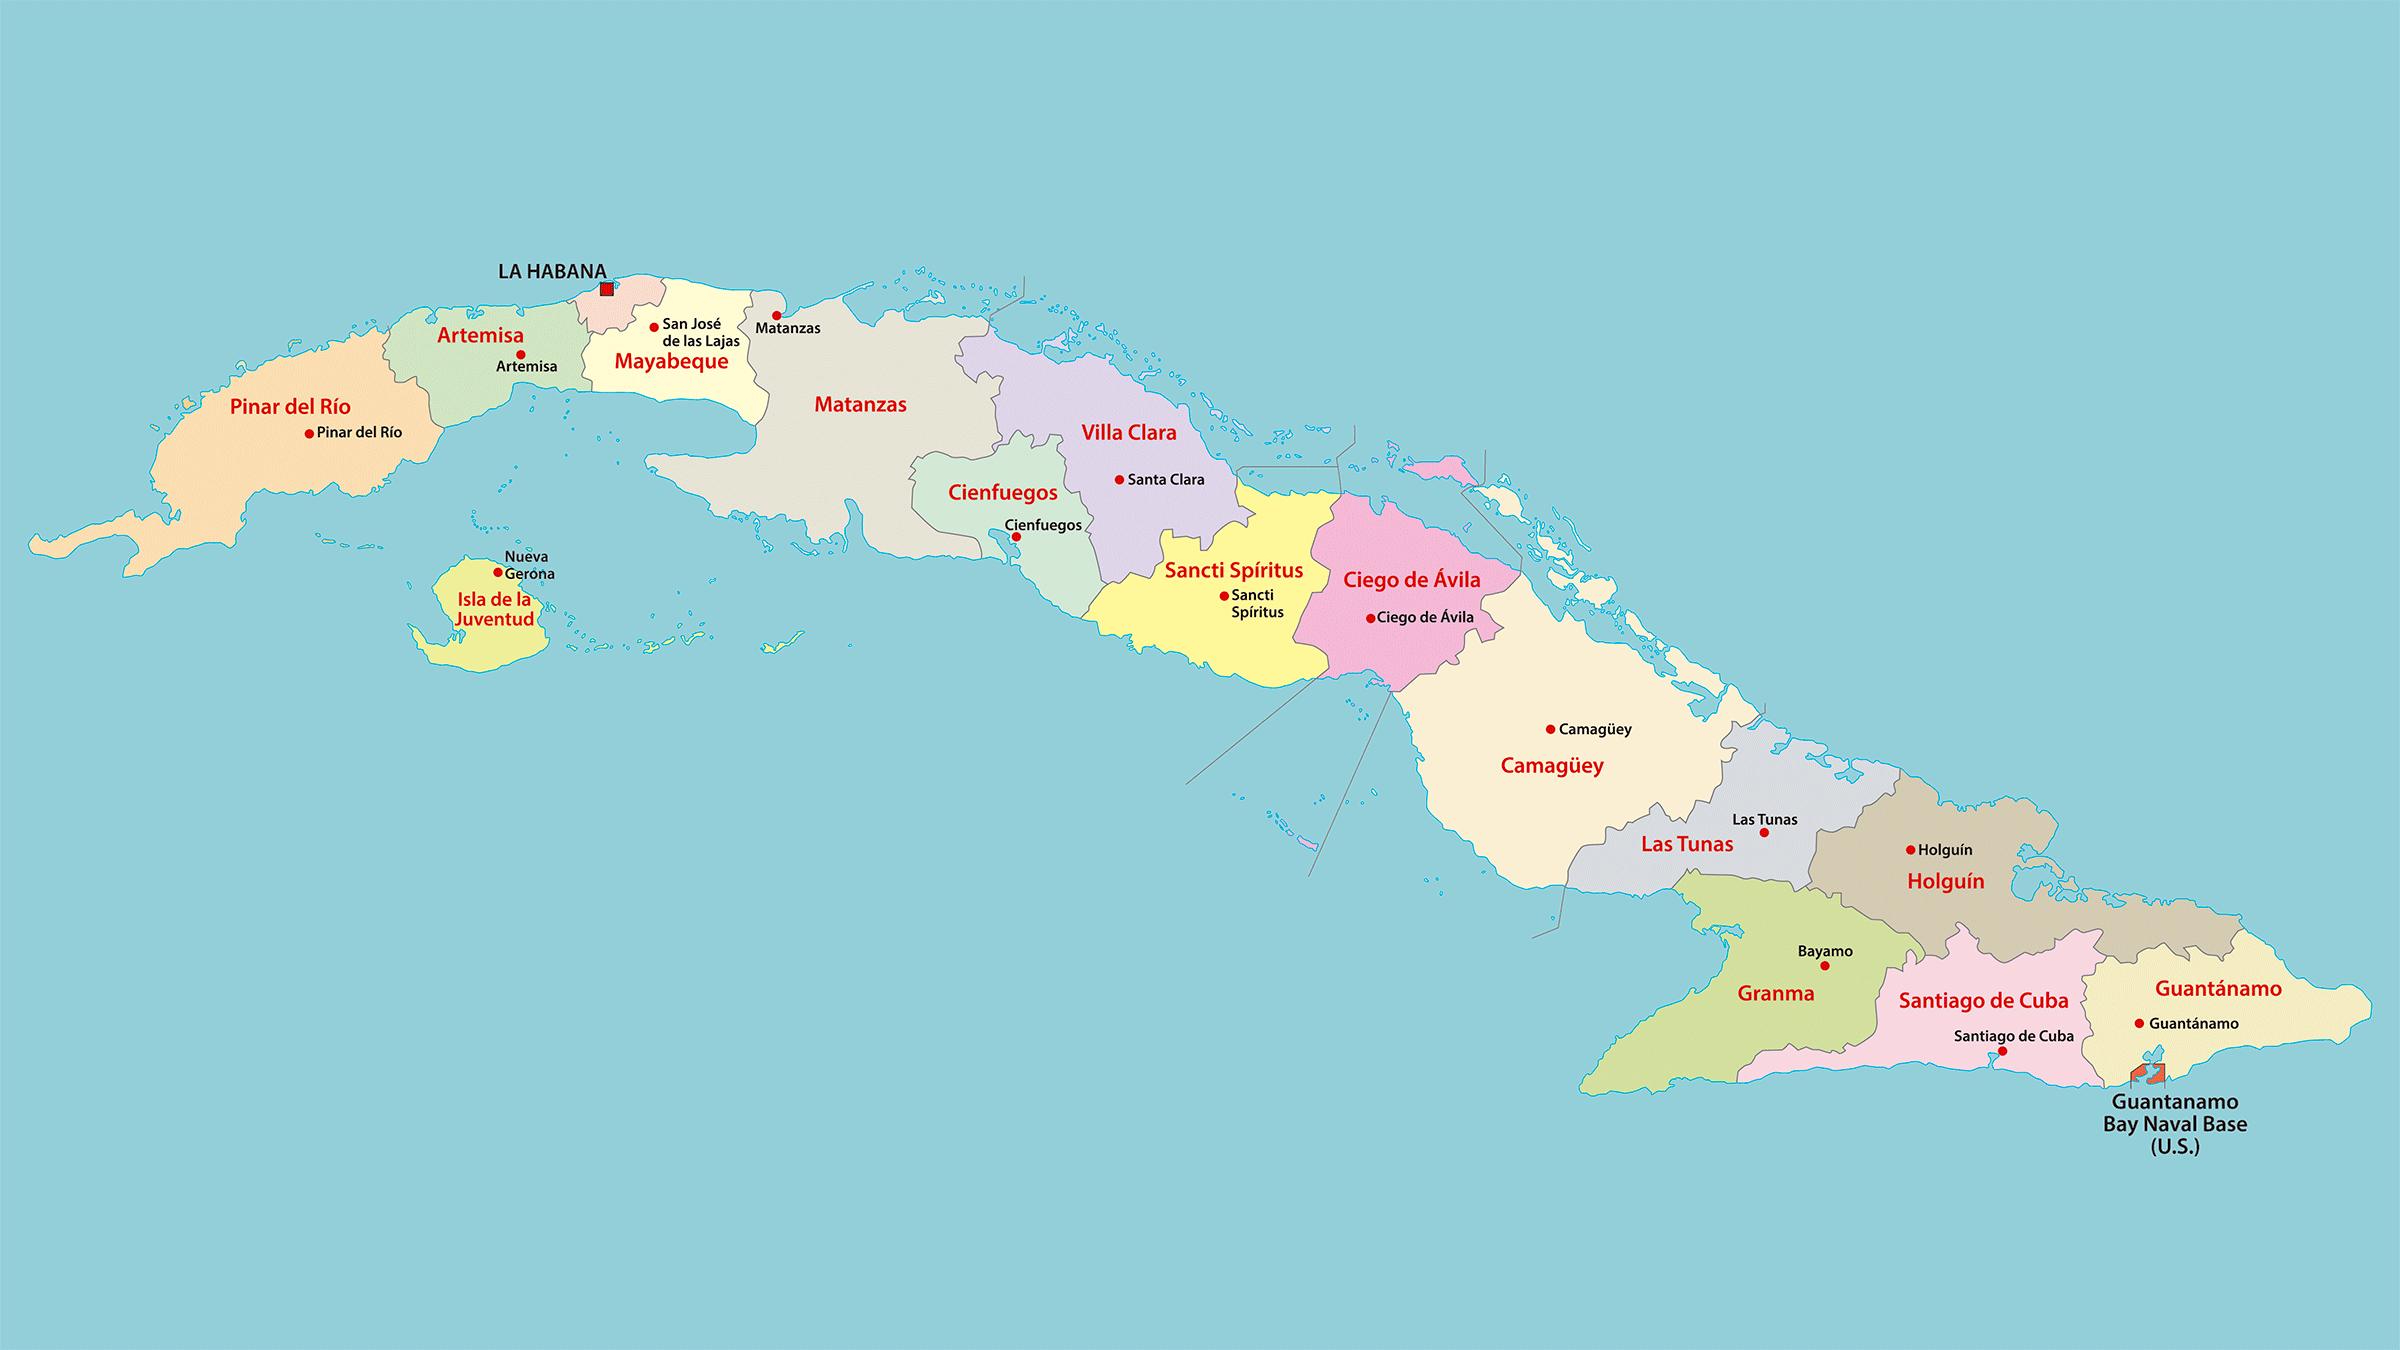 mapa de cuba Mapa político de Cuba mapa de cuba